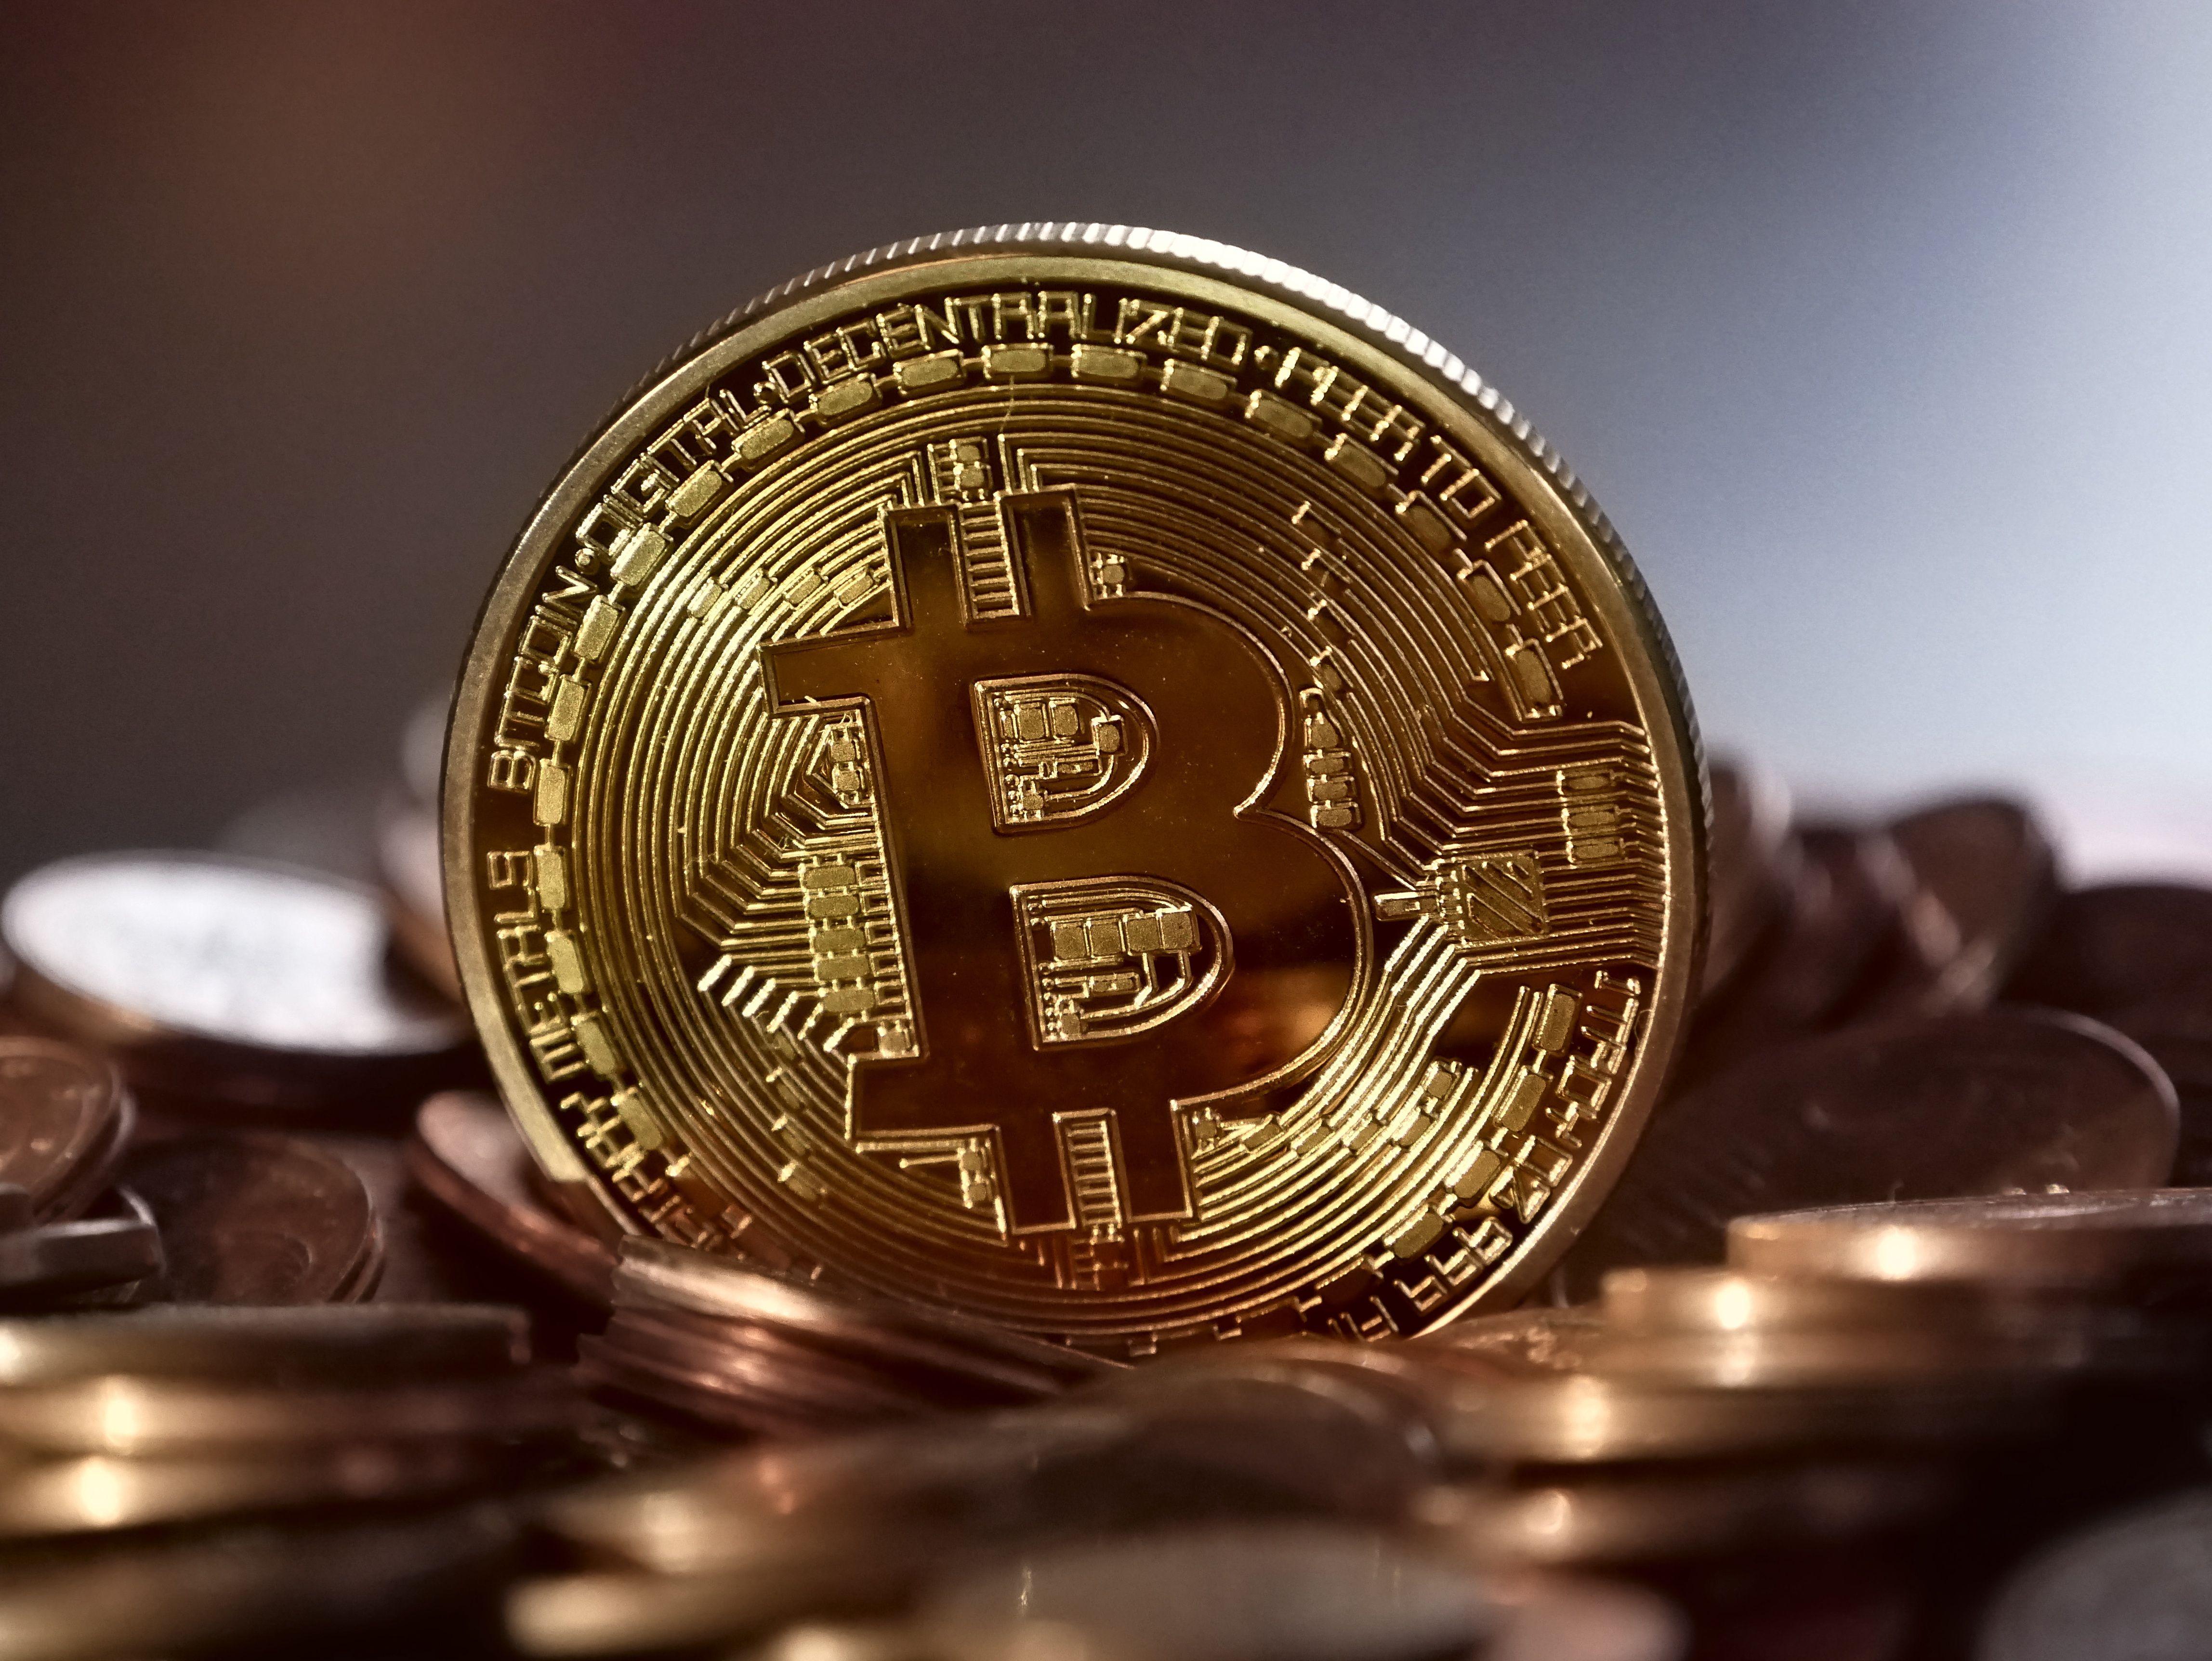 4K Bitcoin Wallpapers   Top 4K Bitcoin Backgrounds 4592x3448